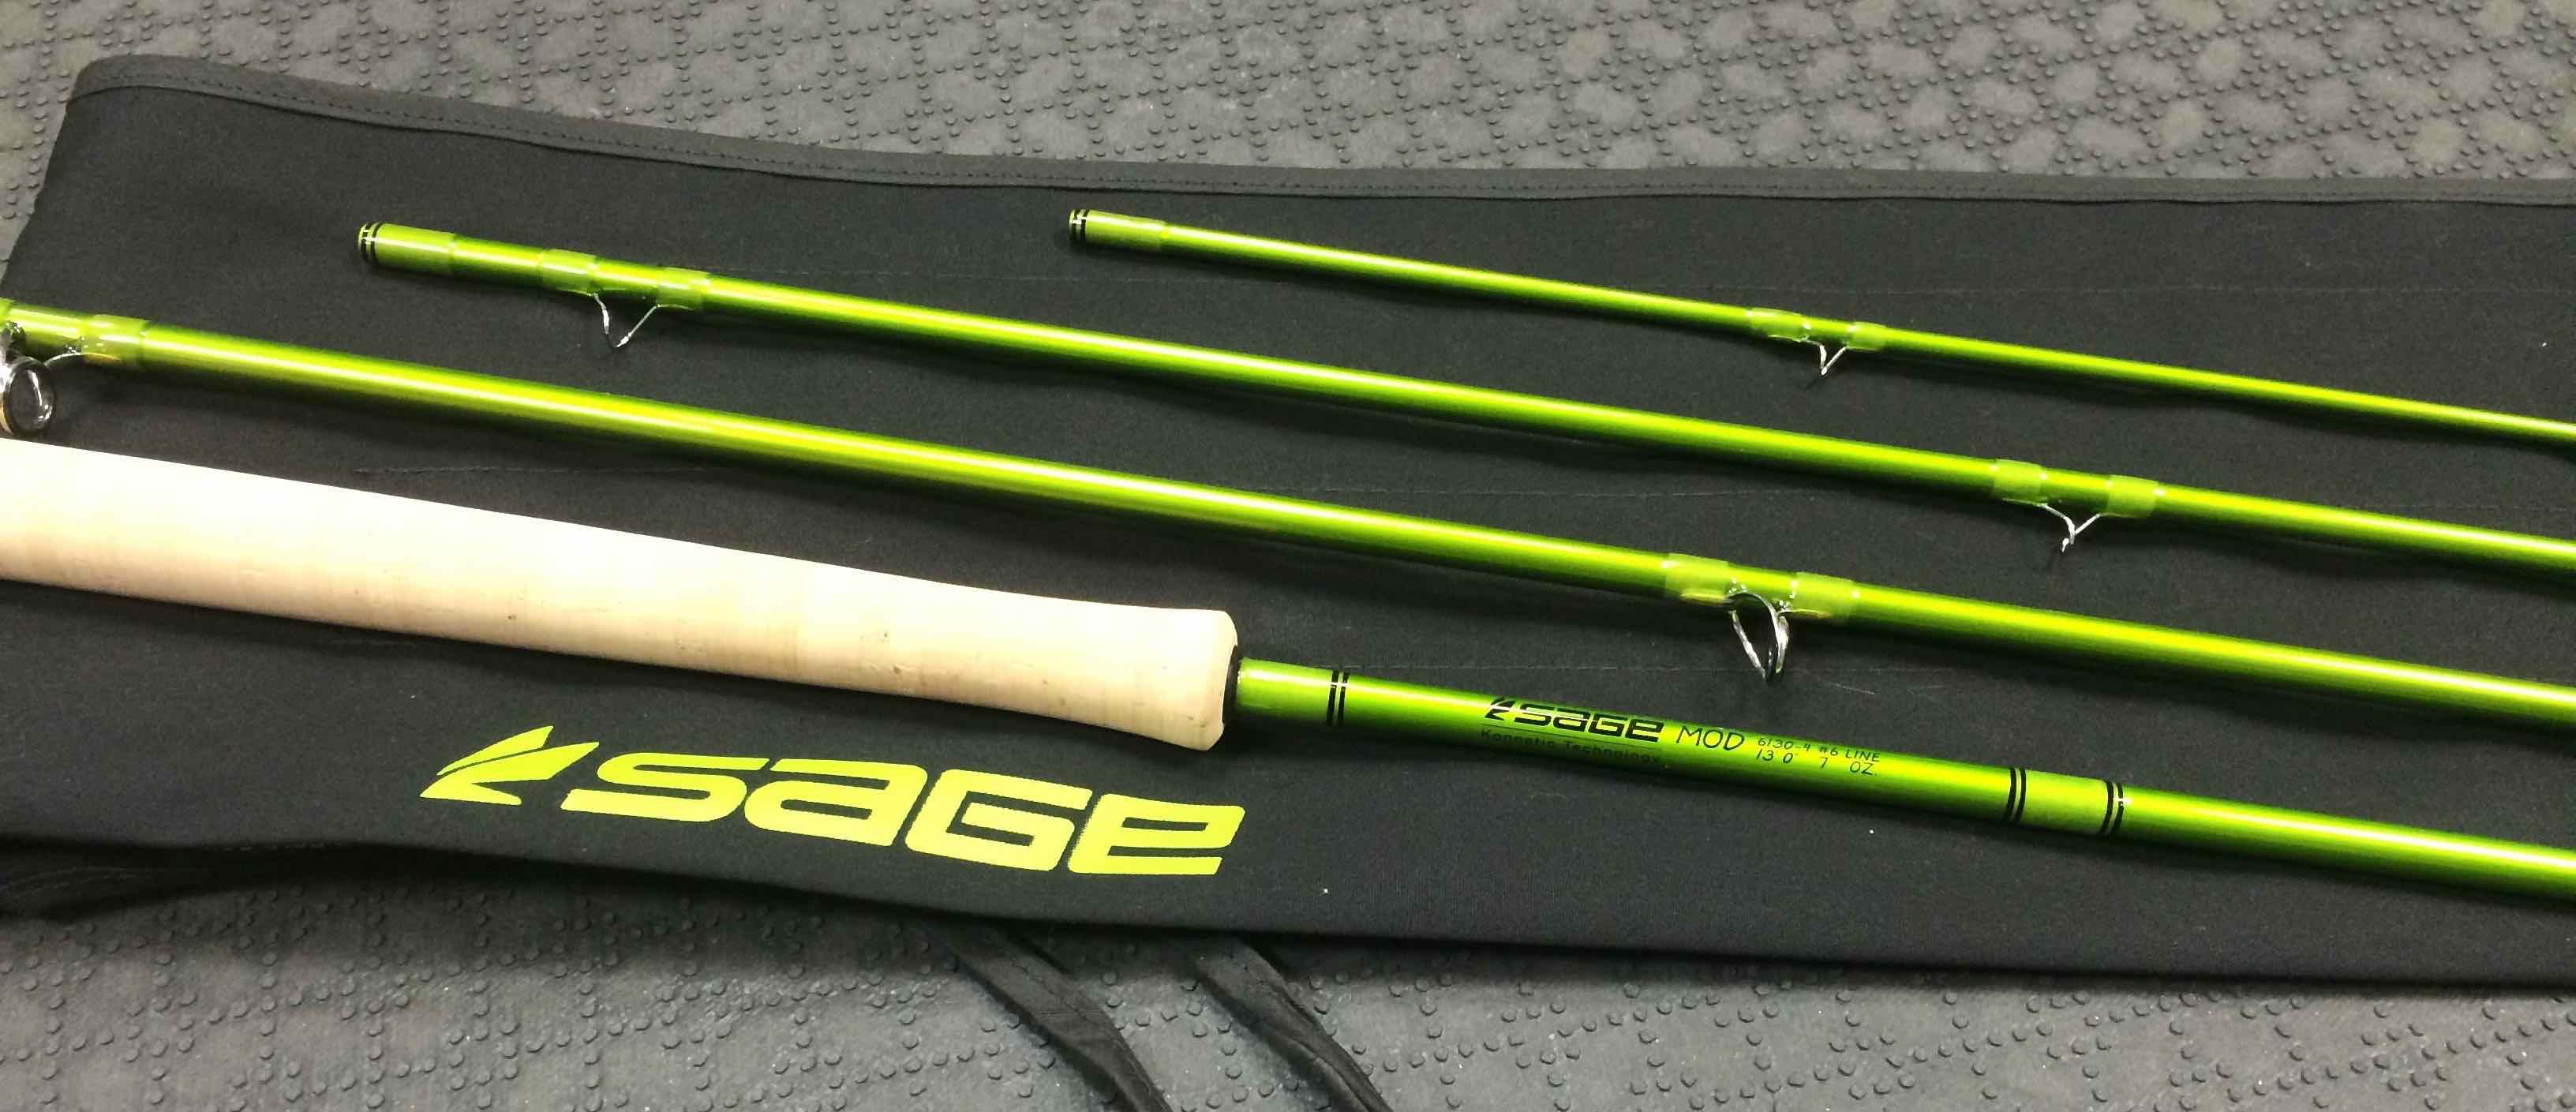 Sage Mod 2015 Spey Rod 6130 4 AA